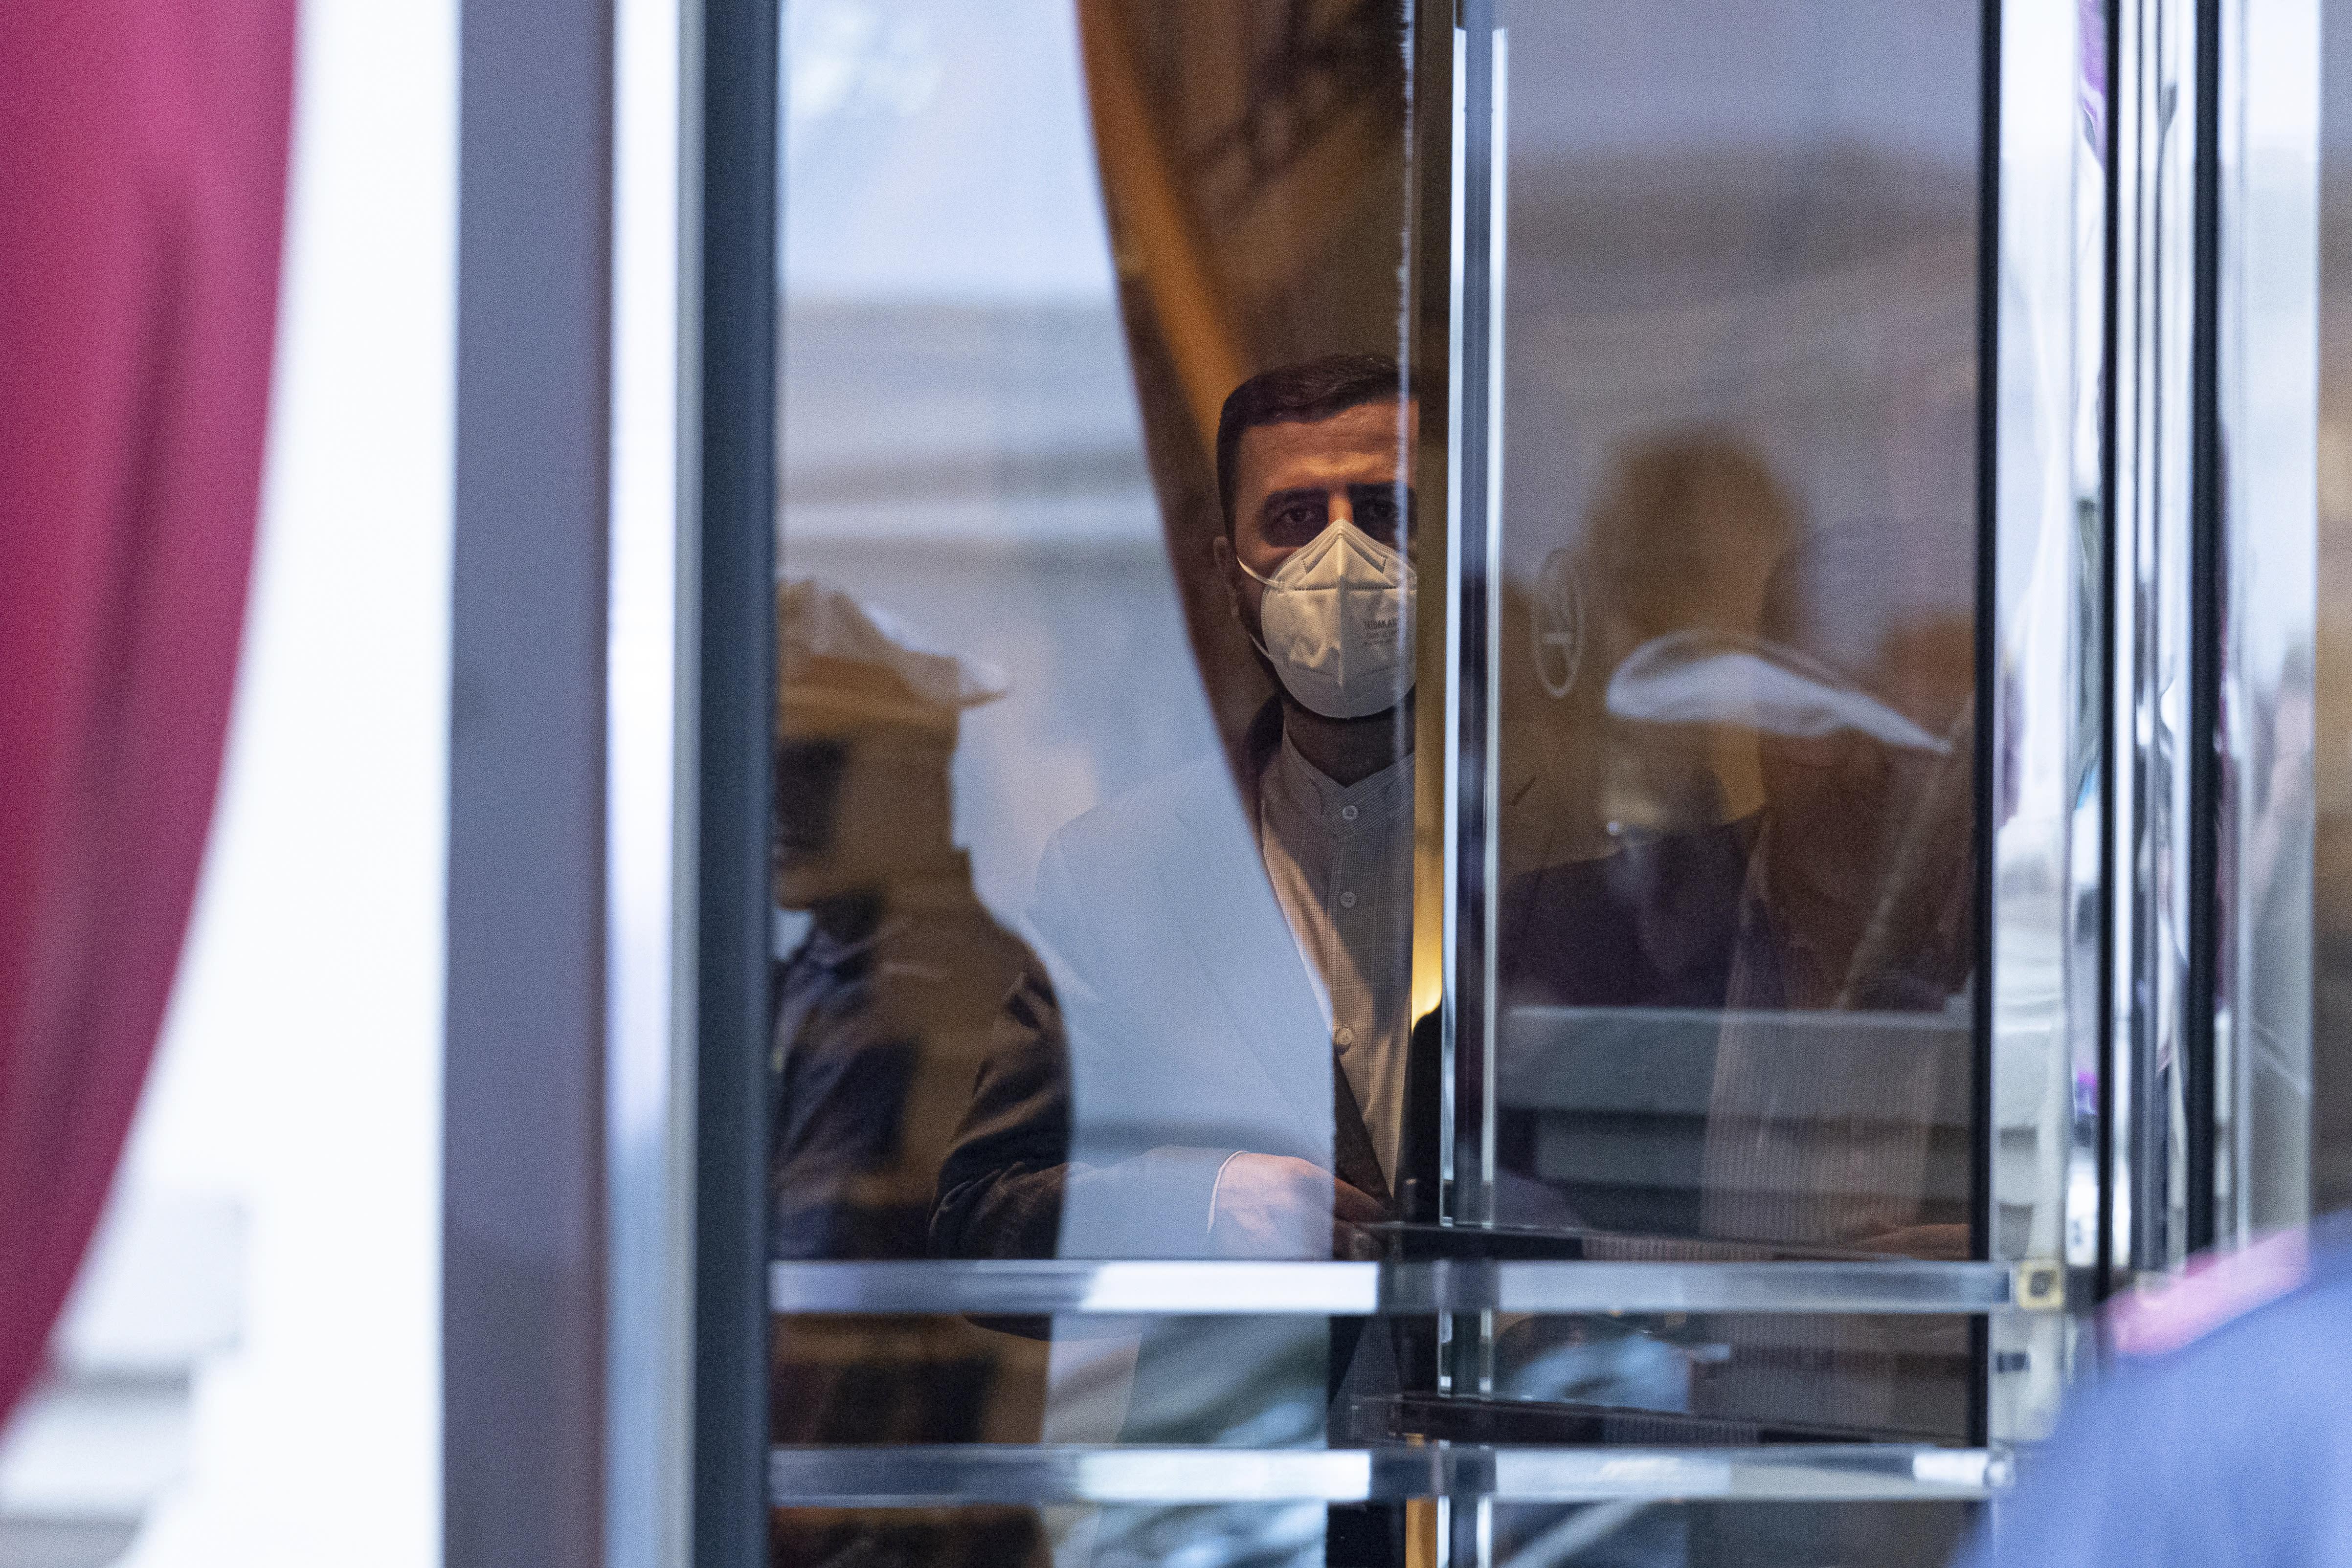 EU talks up hope of breakthrough at Iran nuclear meetings